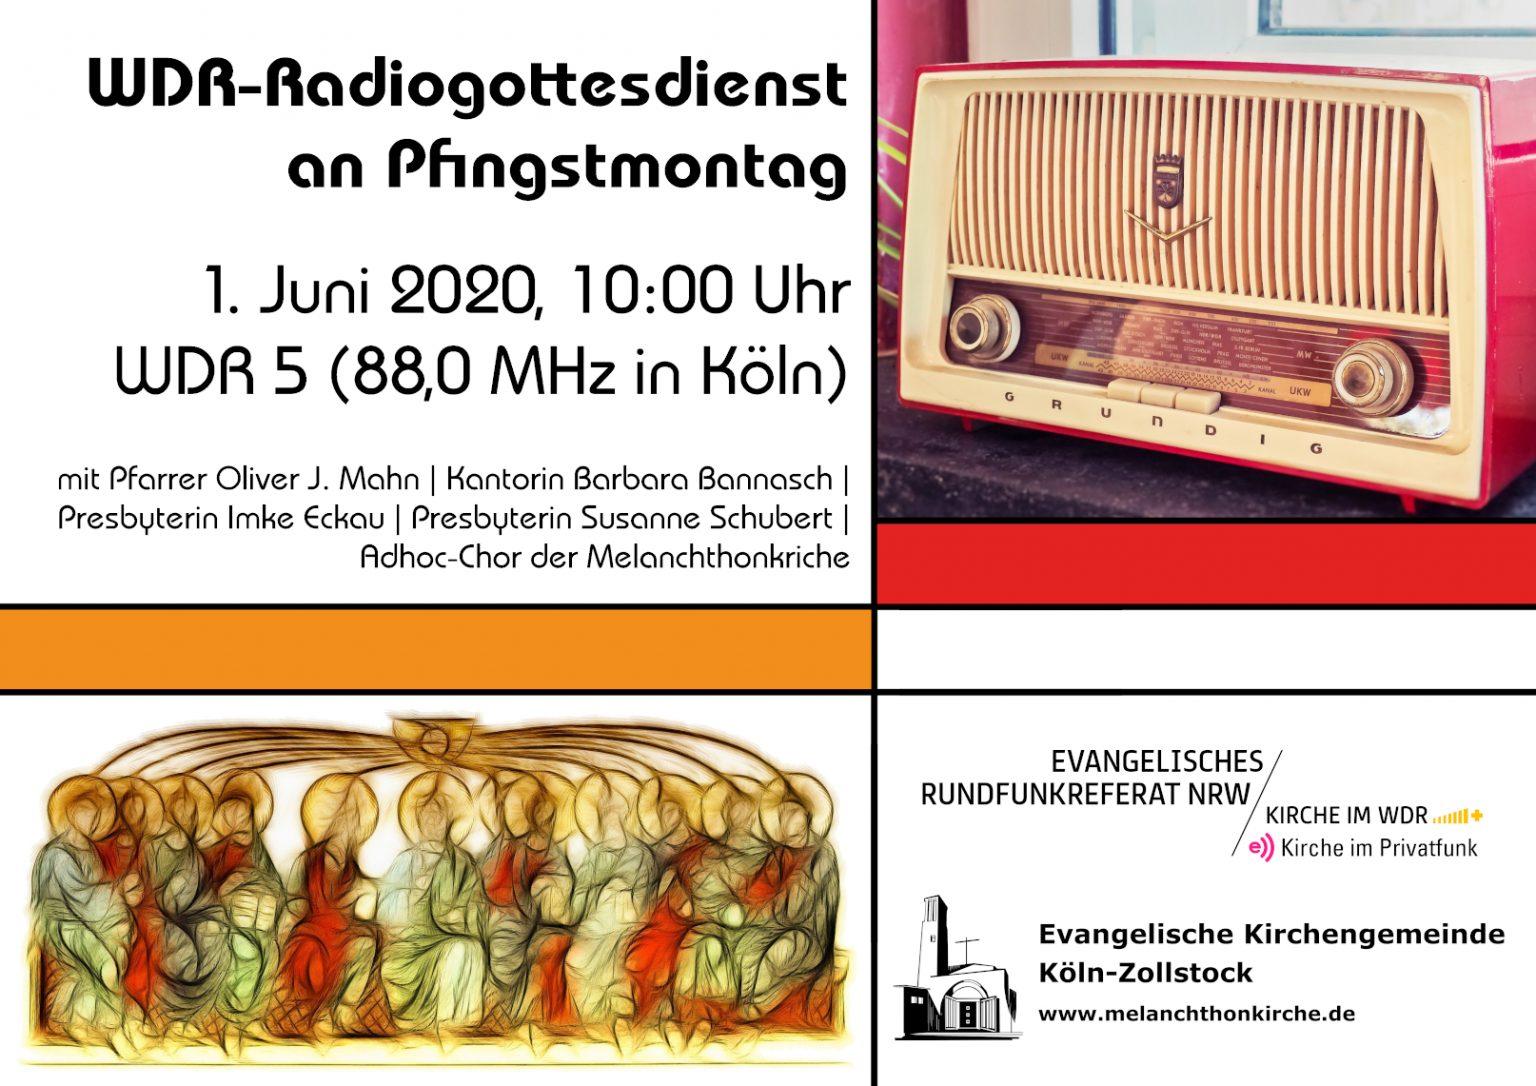 wdr radiogottesdienst